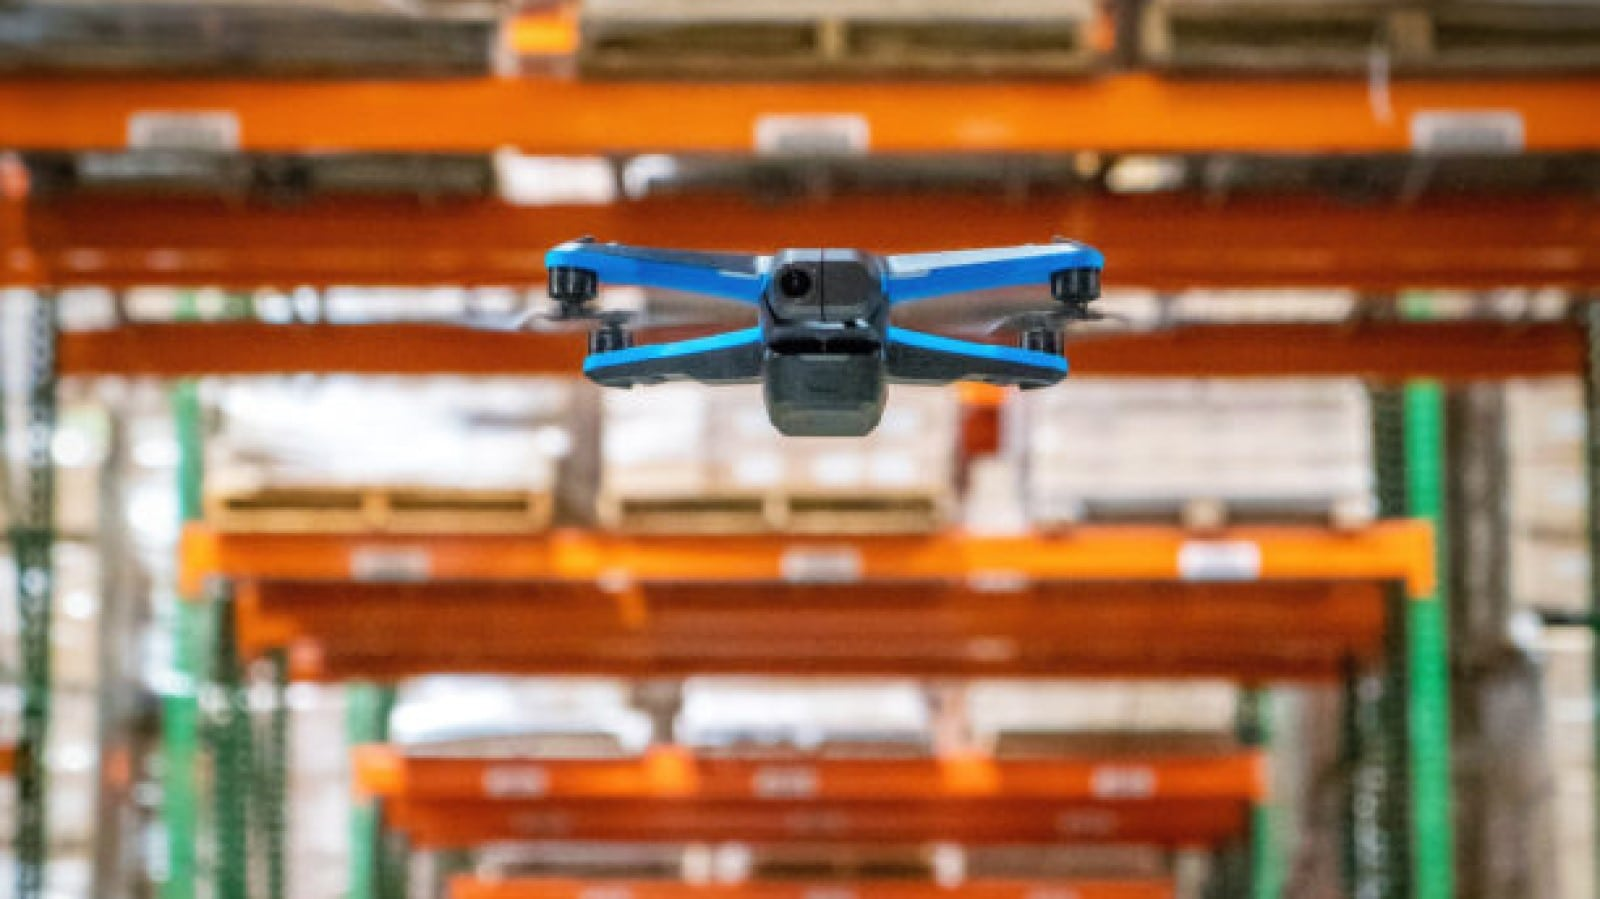 skydio drone stocktaking in warehouse